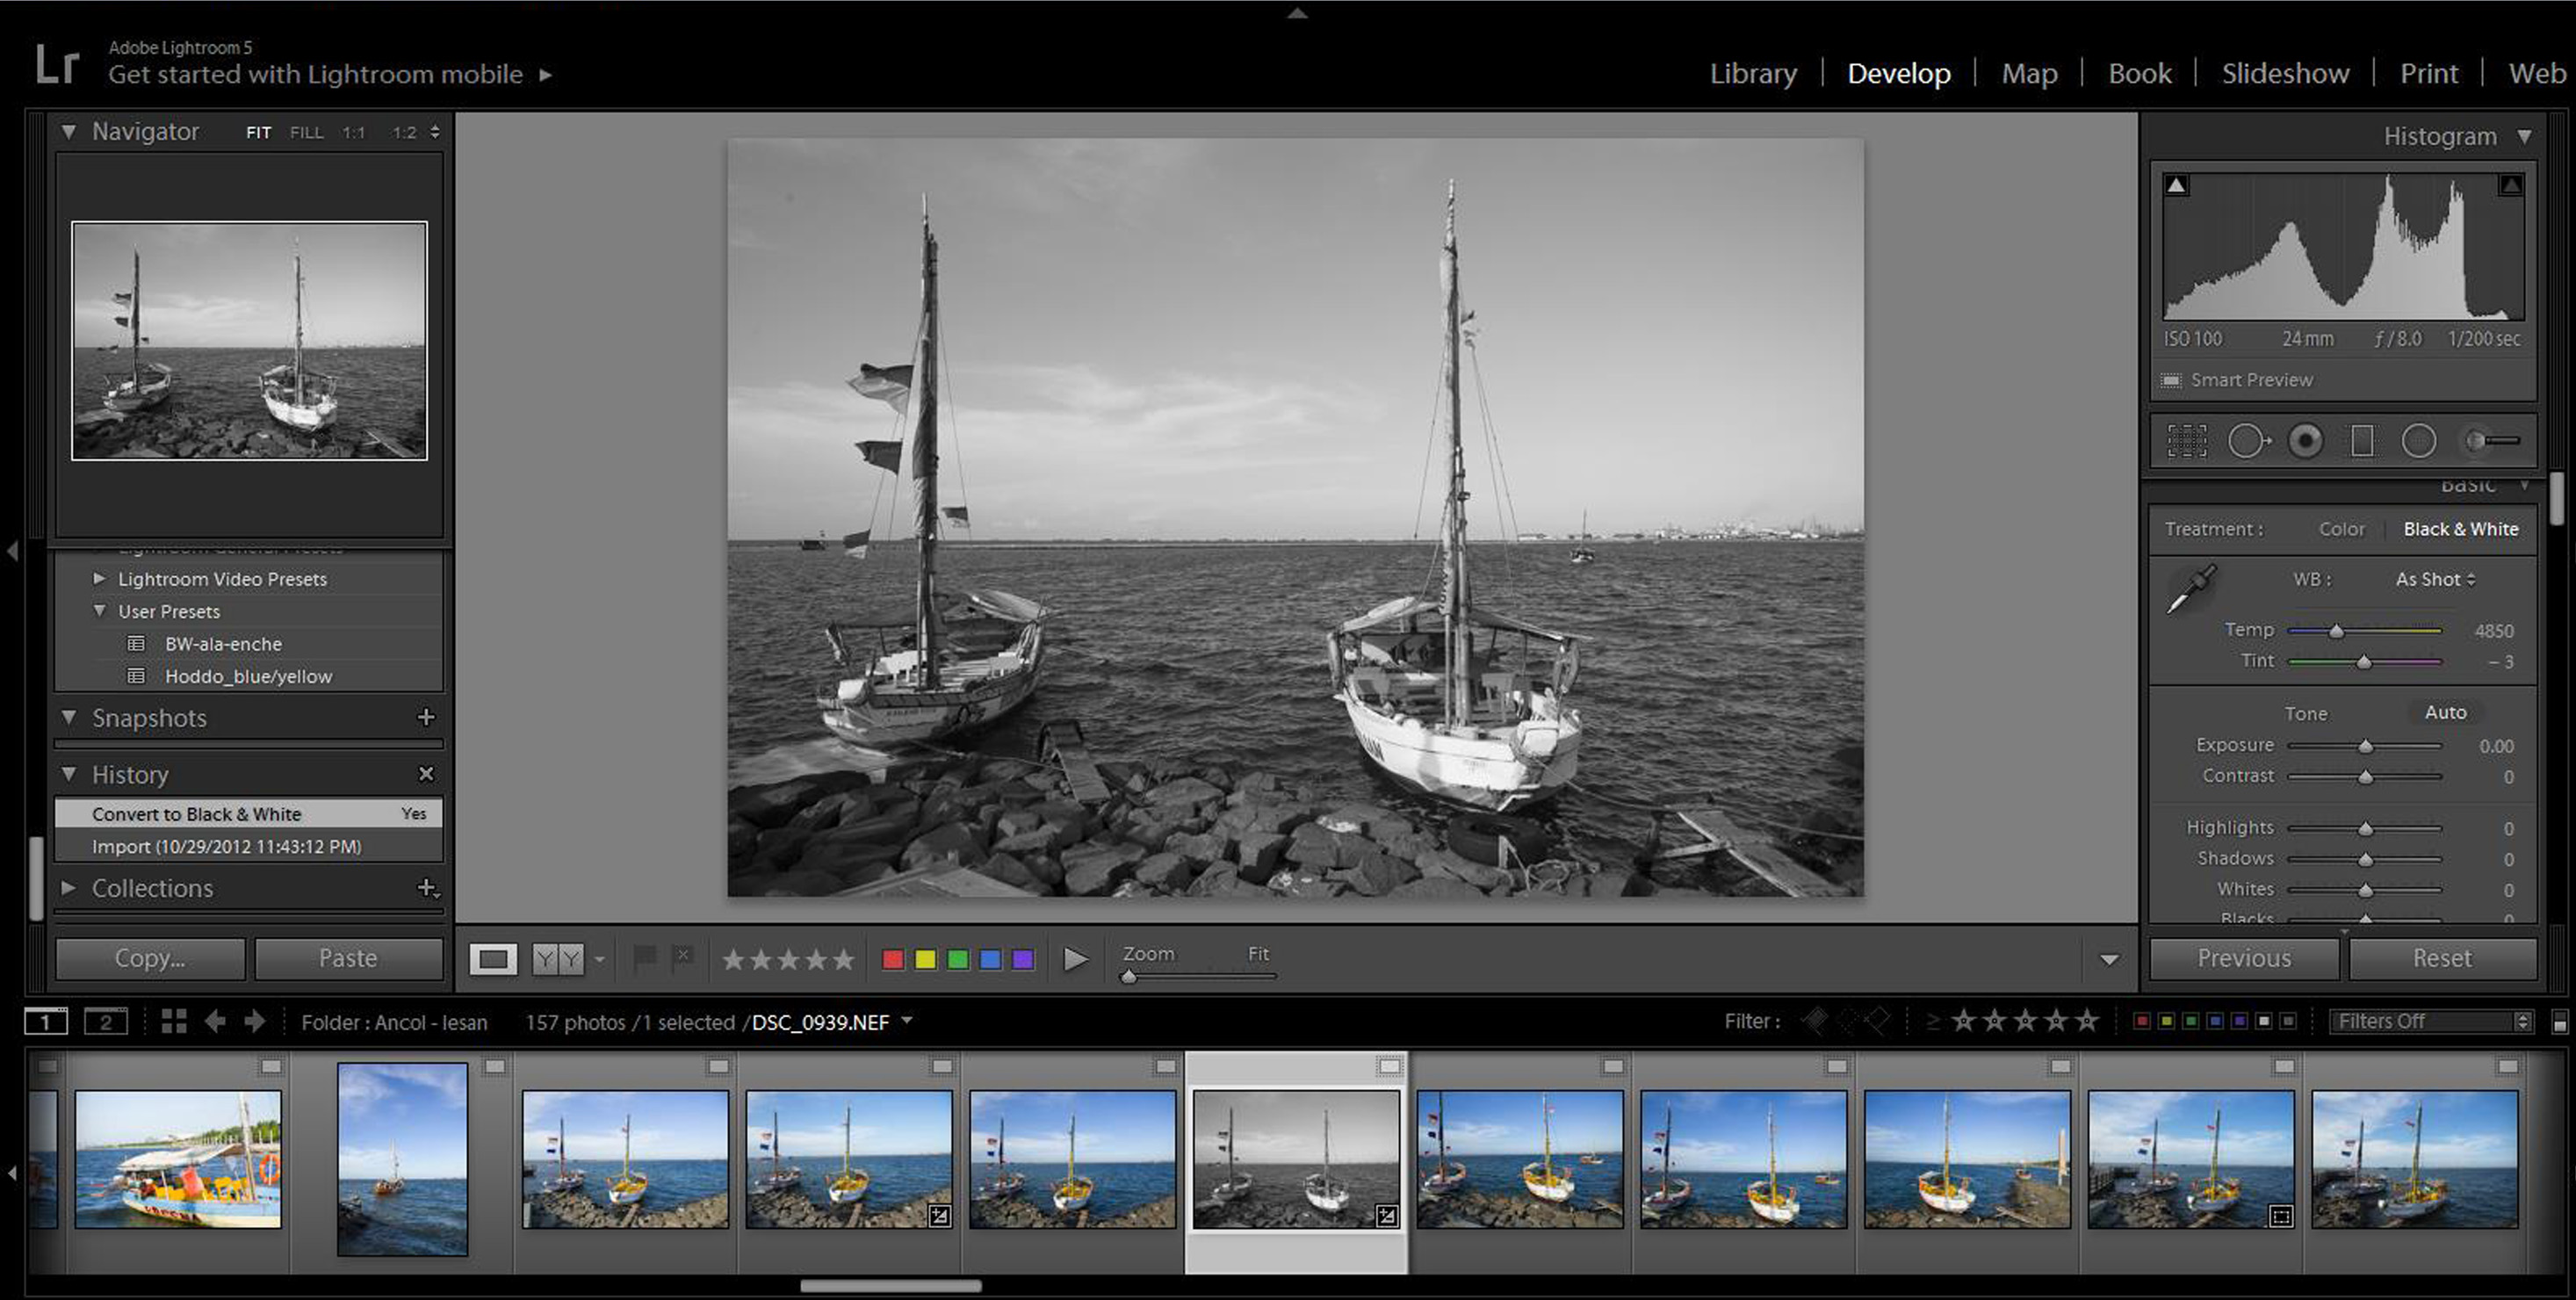 edit foto smart preview1